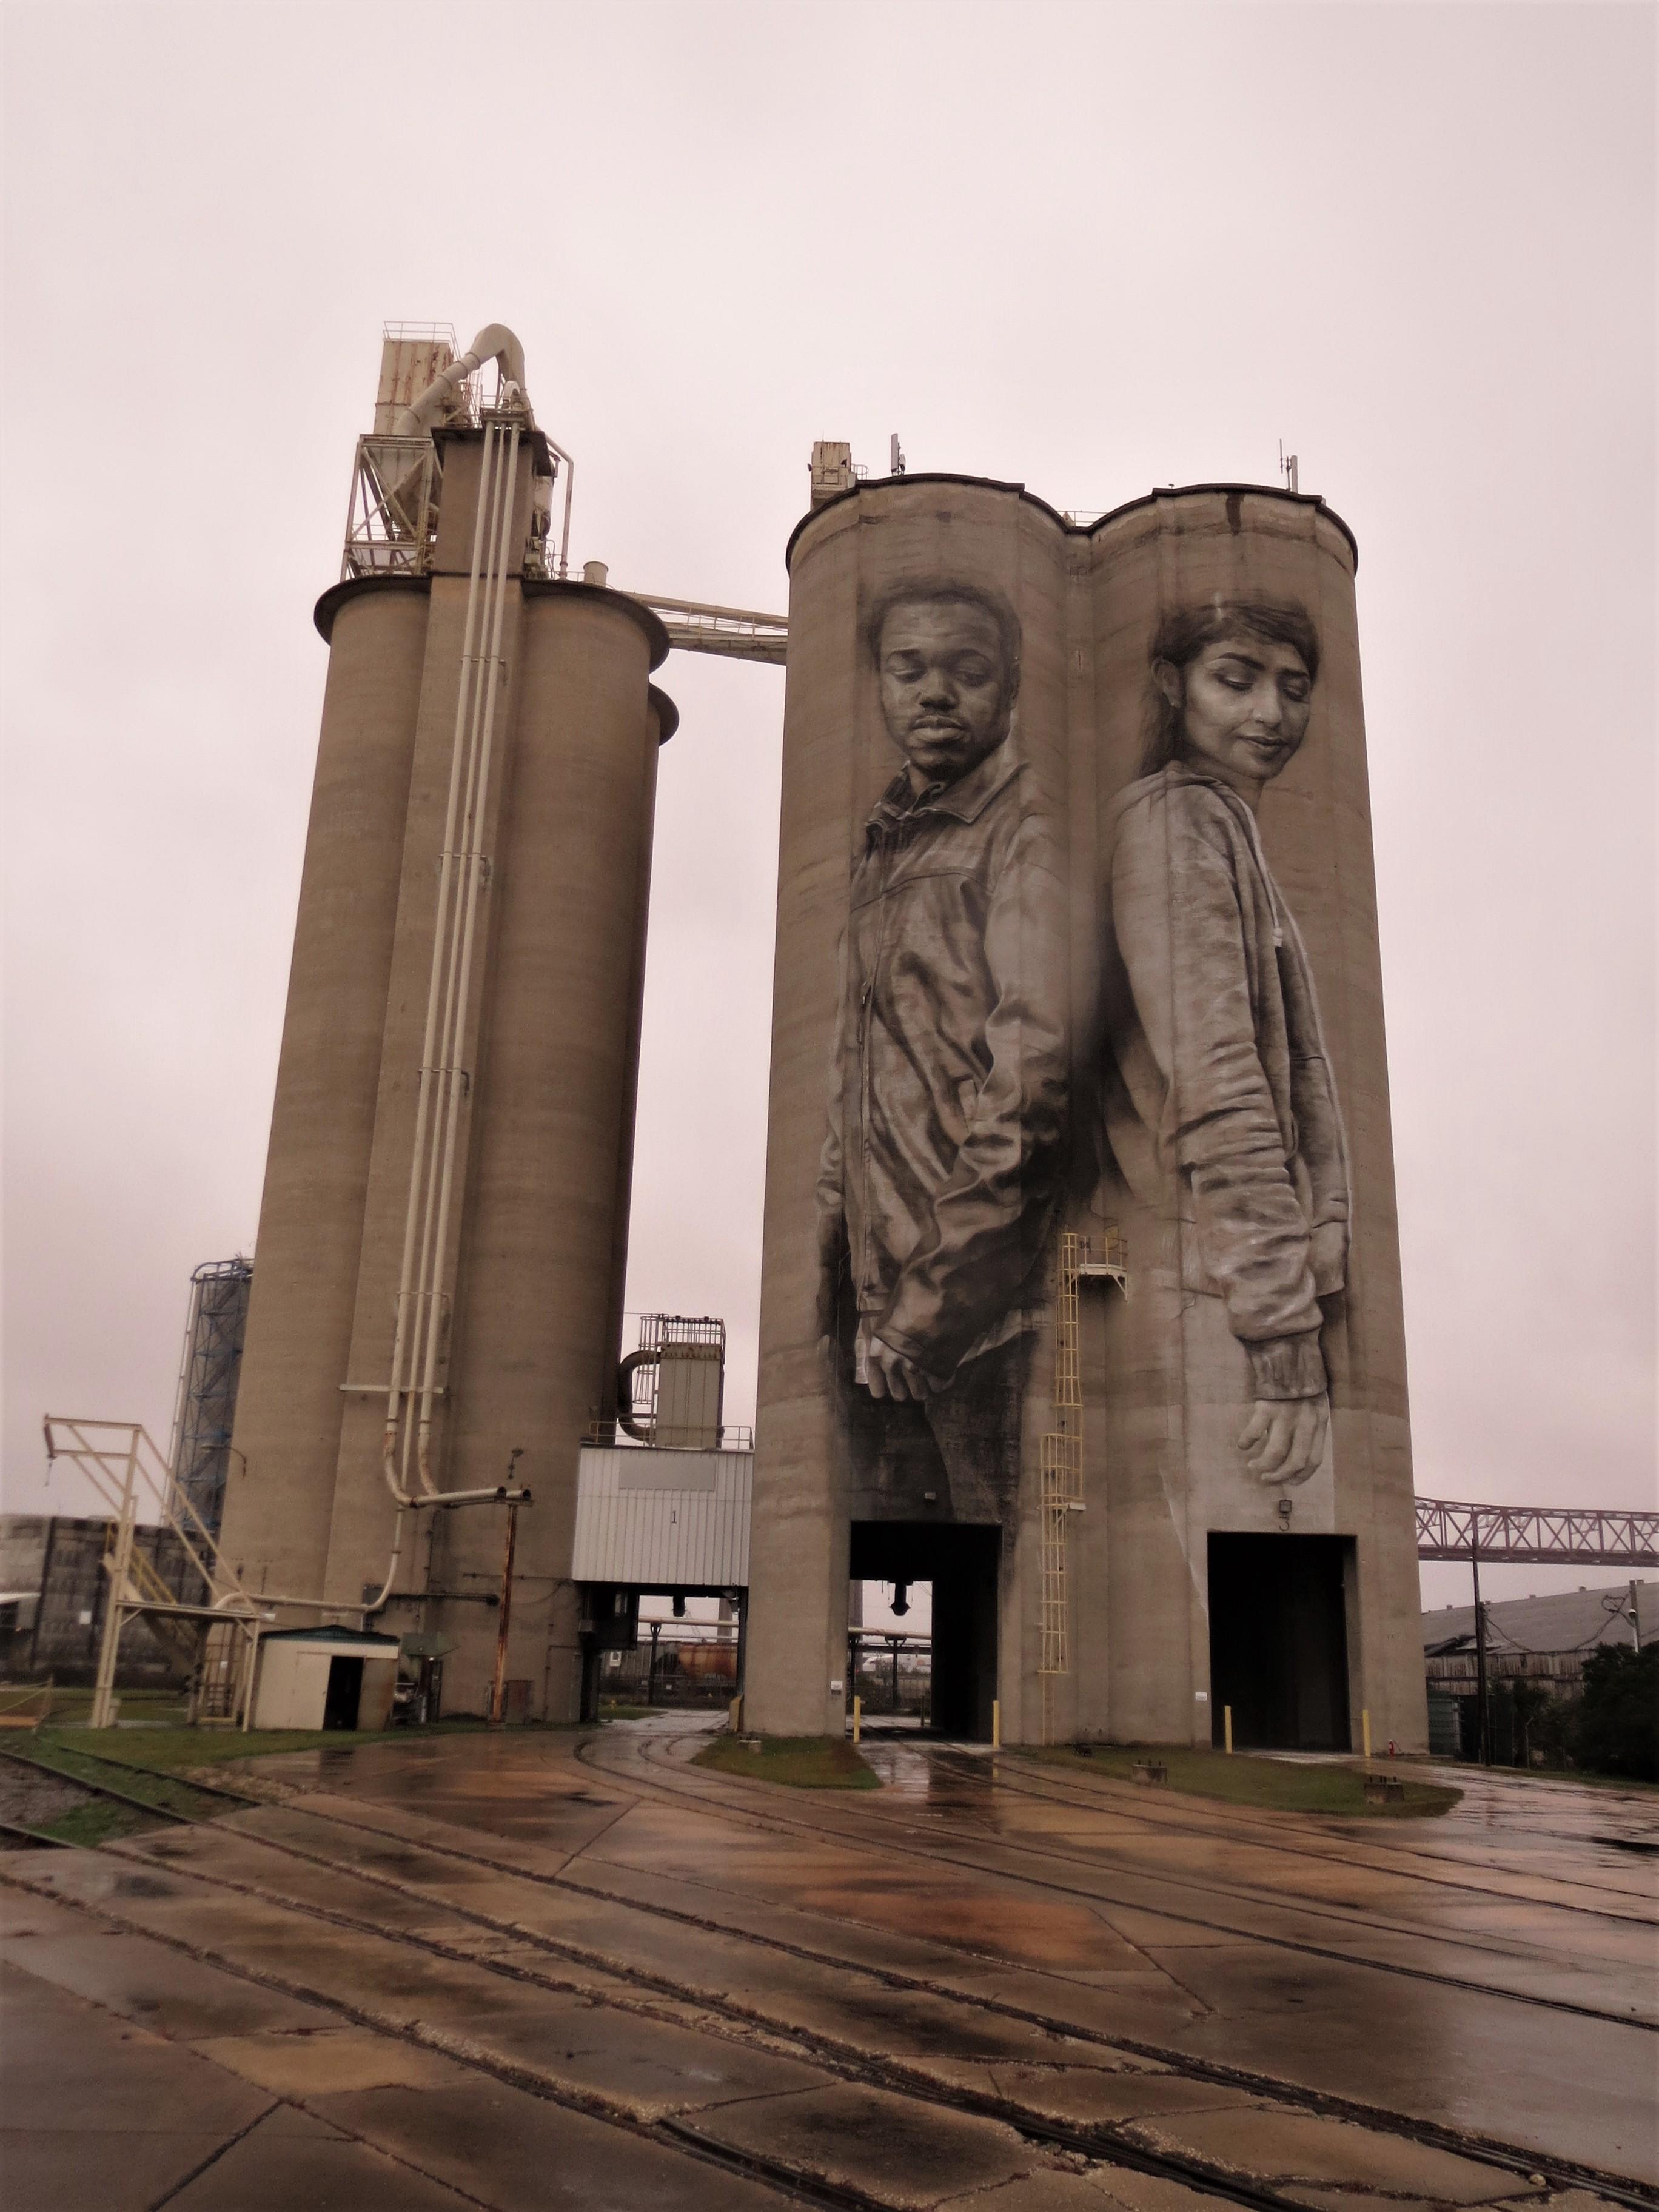 Fairfield: Lafarge Cement Silos / Crooms and Mahmoud Murals ...